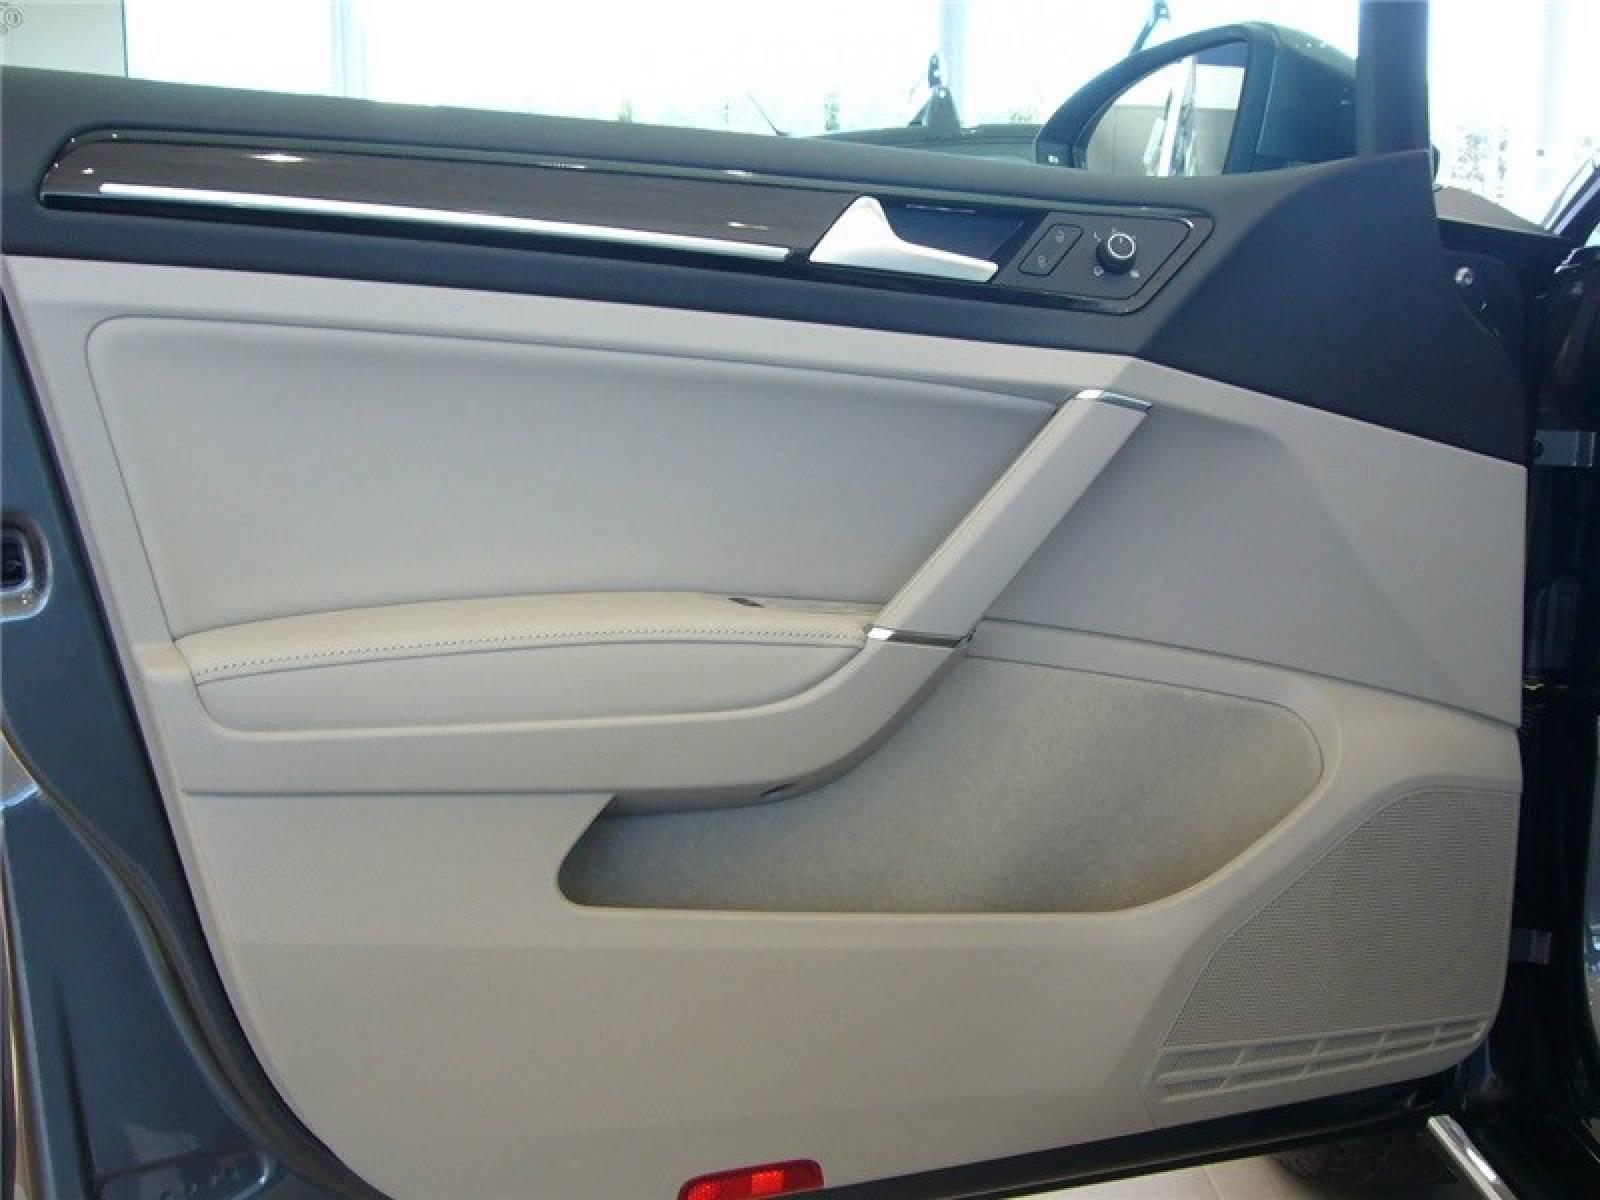 VOLKSWAGEN Golf SW 1.5 TSI 150 EVO BlueMotion Technology DSG7 - véhicule neuf - LEMAUVIEL AUTOMOBILES - Présentation site web V2 - Lemauviel automobiles - AVRANCHES - 50300 - LE VAL-SAINT-PÈRE - 5